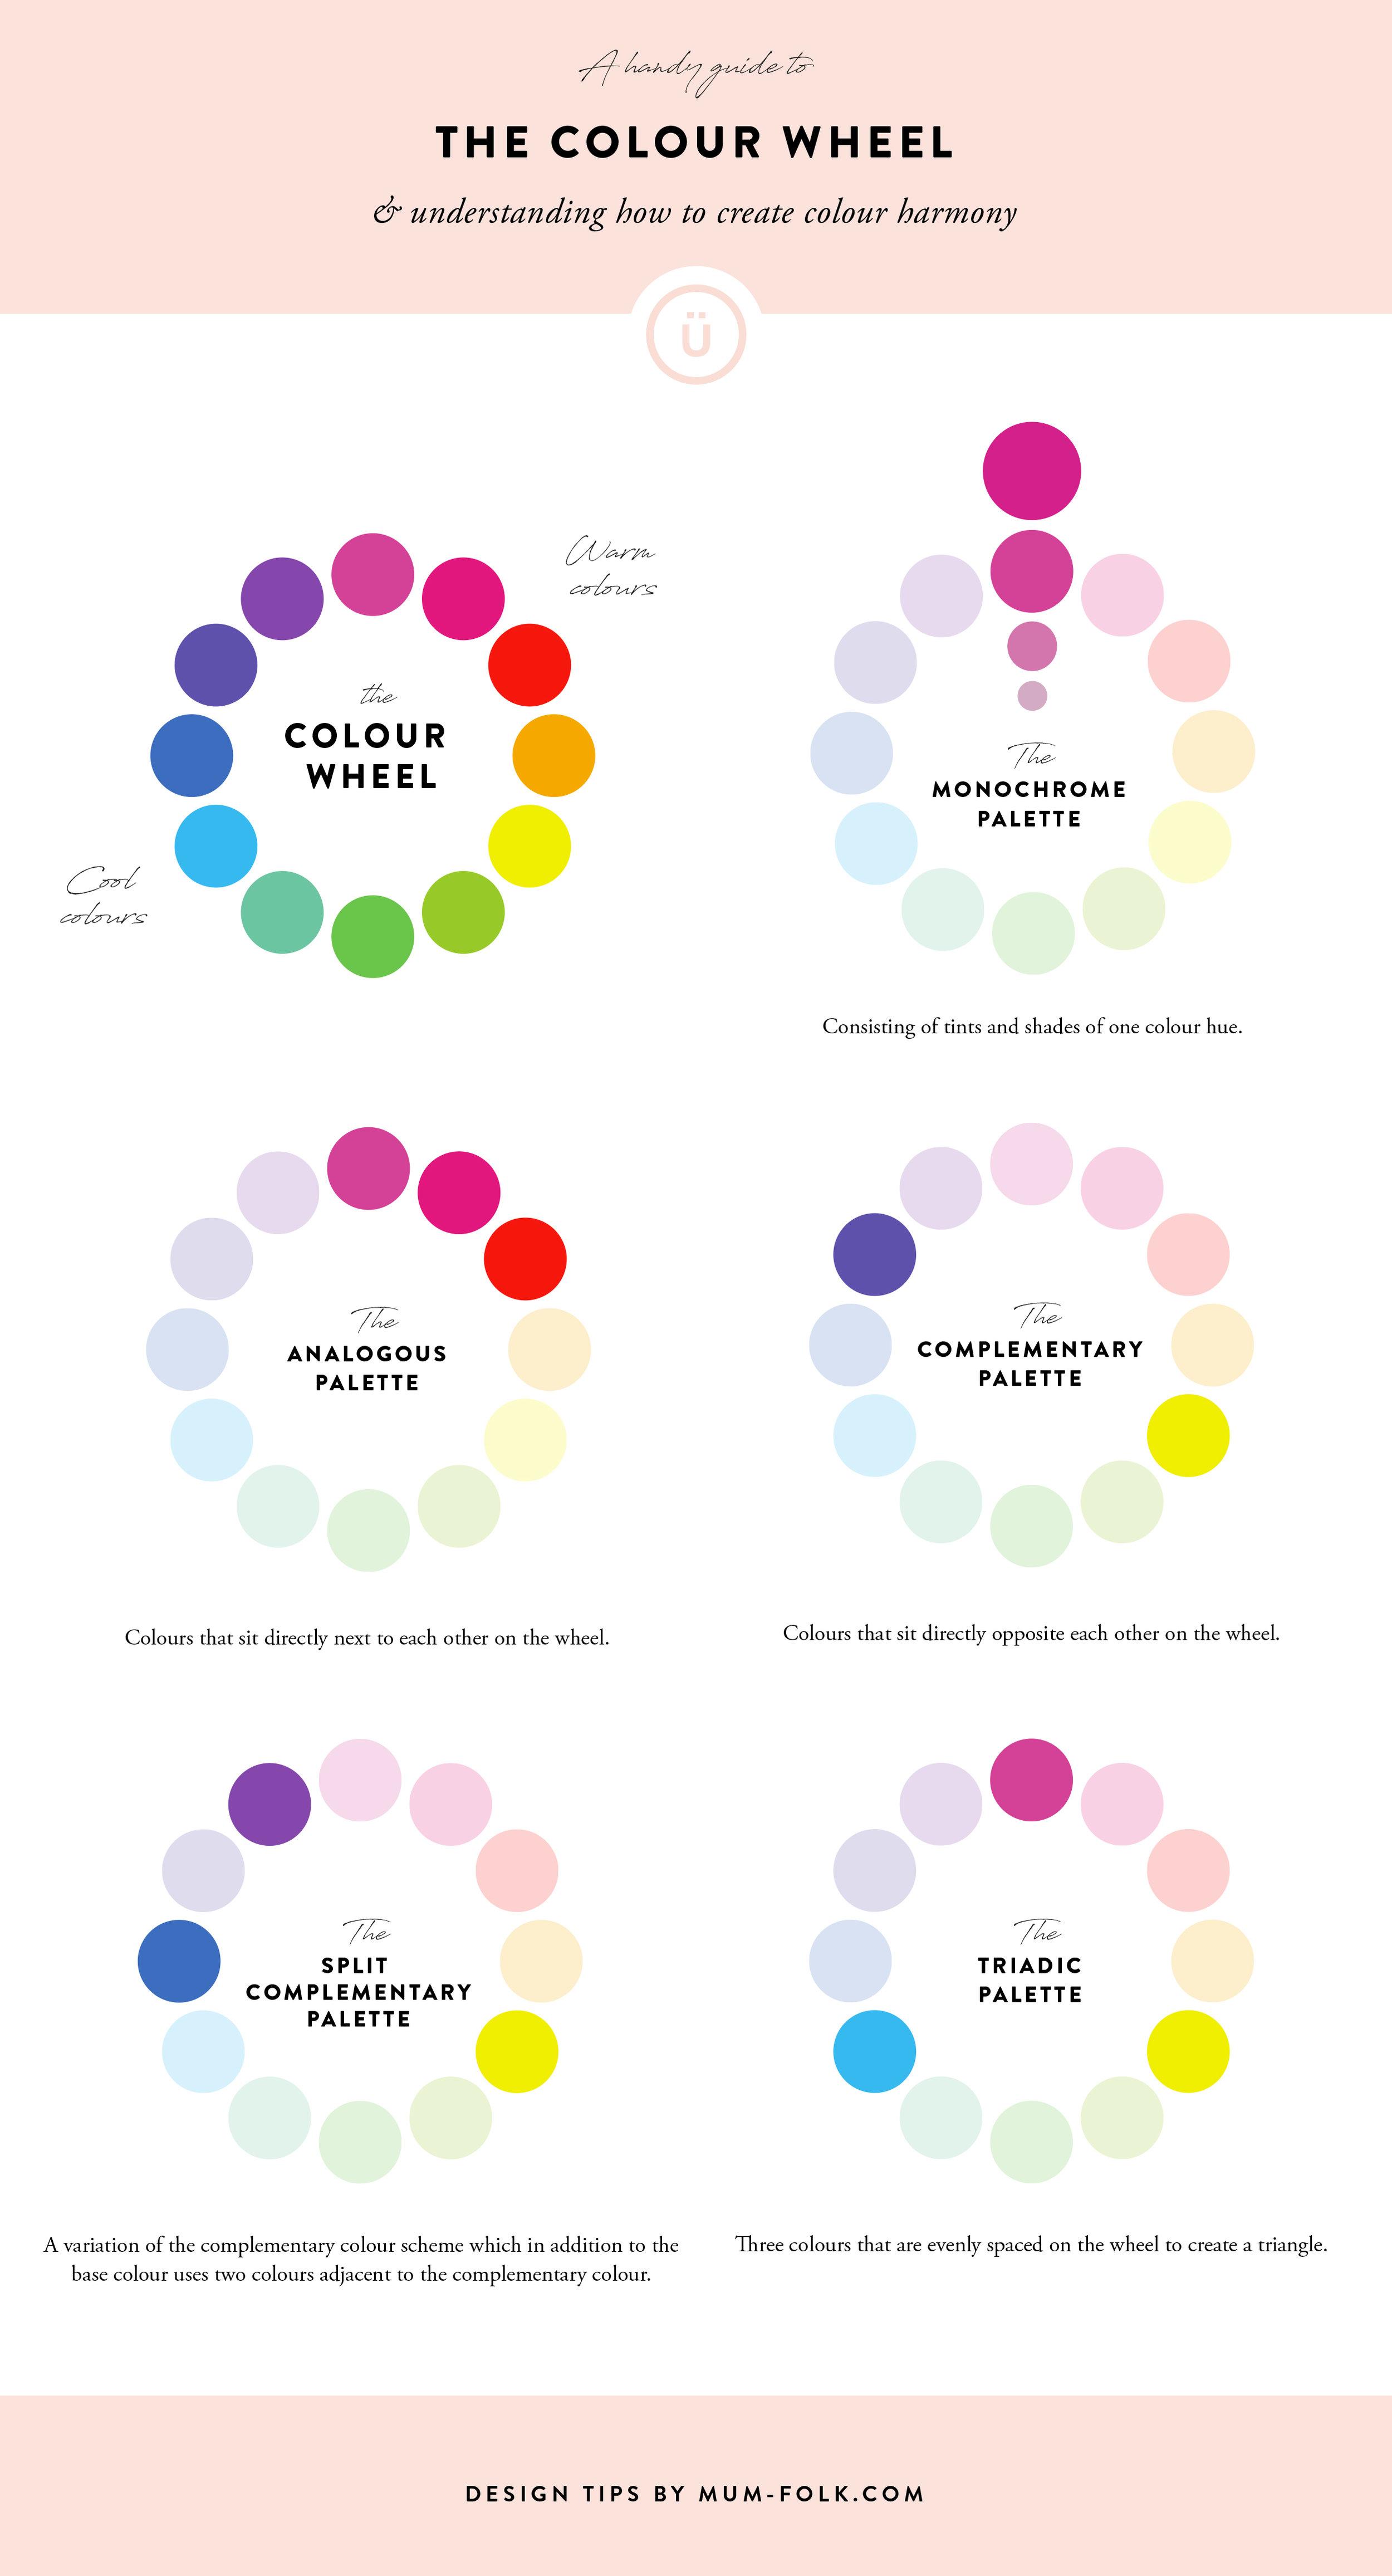 DESIGNTIPS_colourharmony.jpg